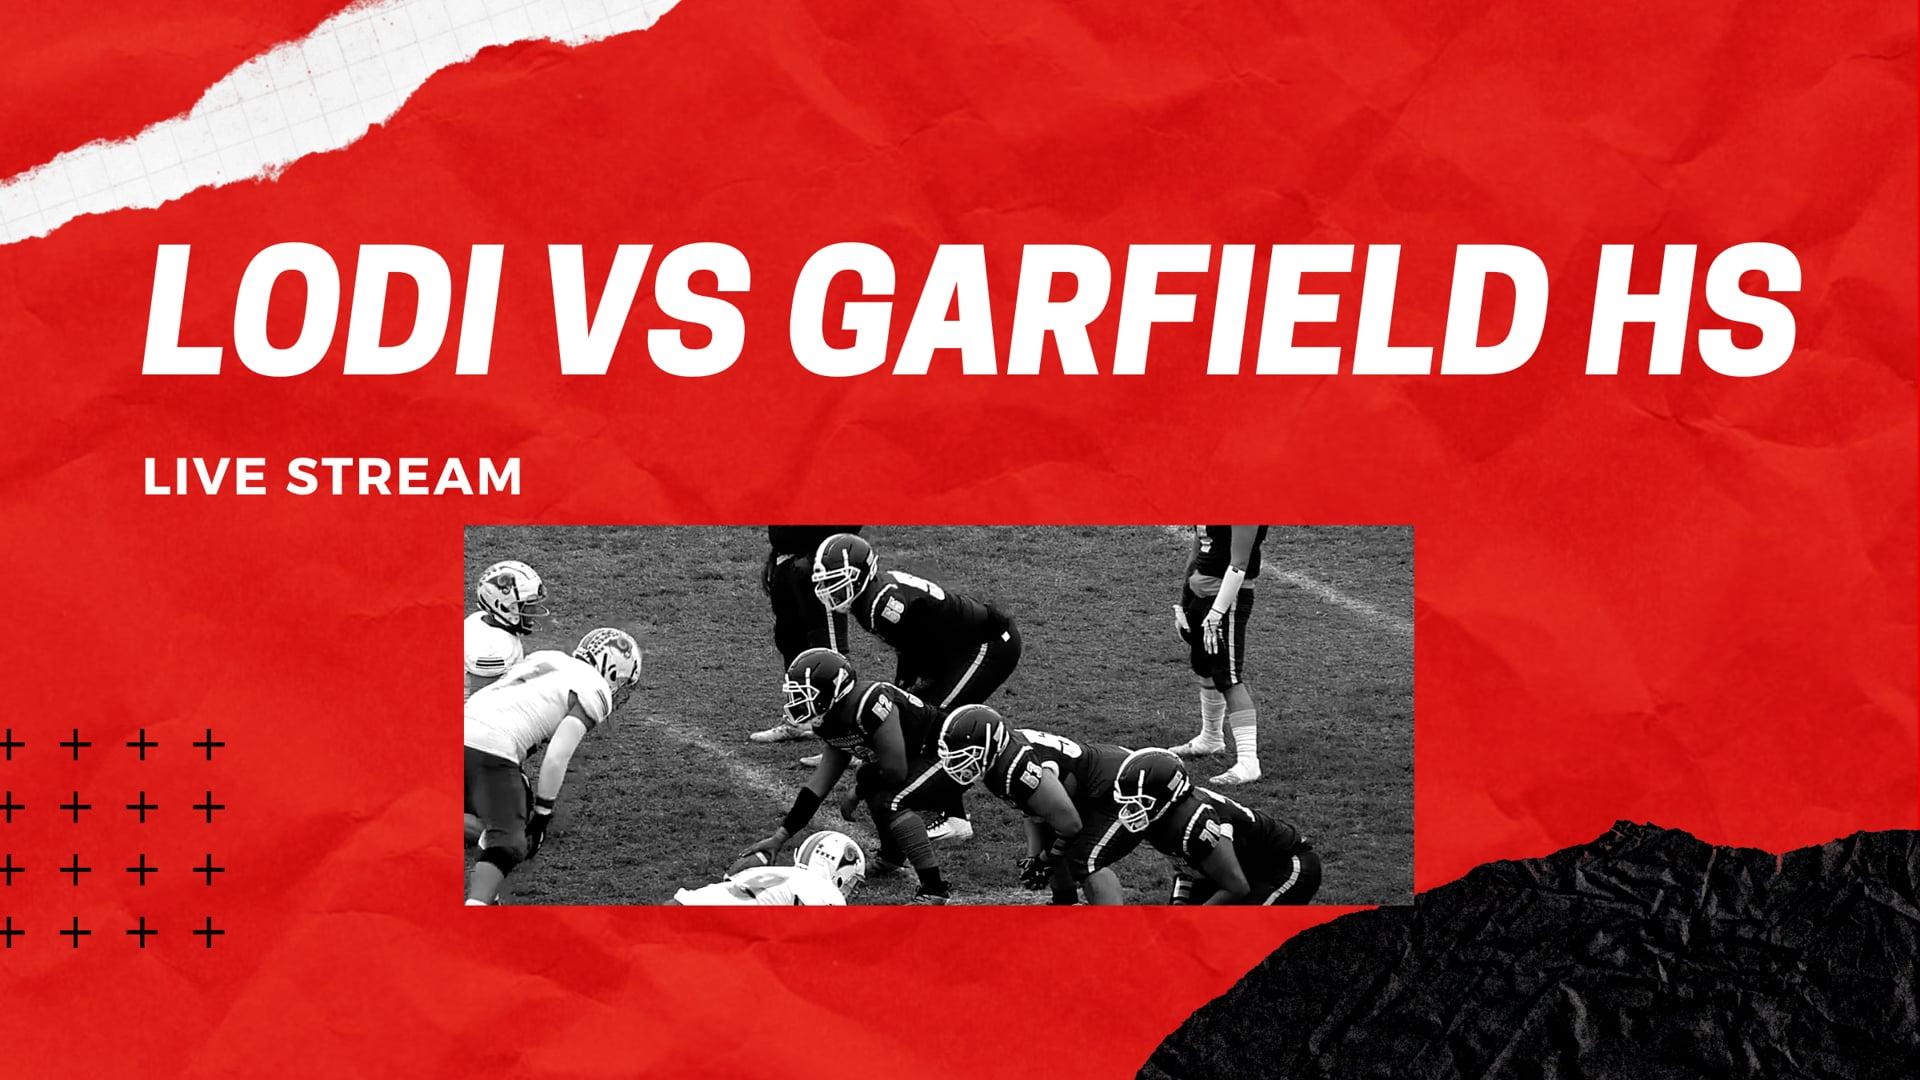 LODI GARFIELD GAME